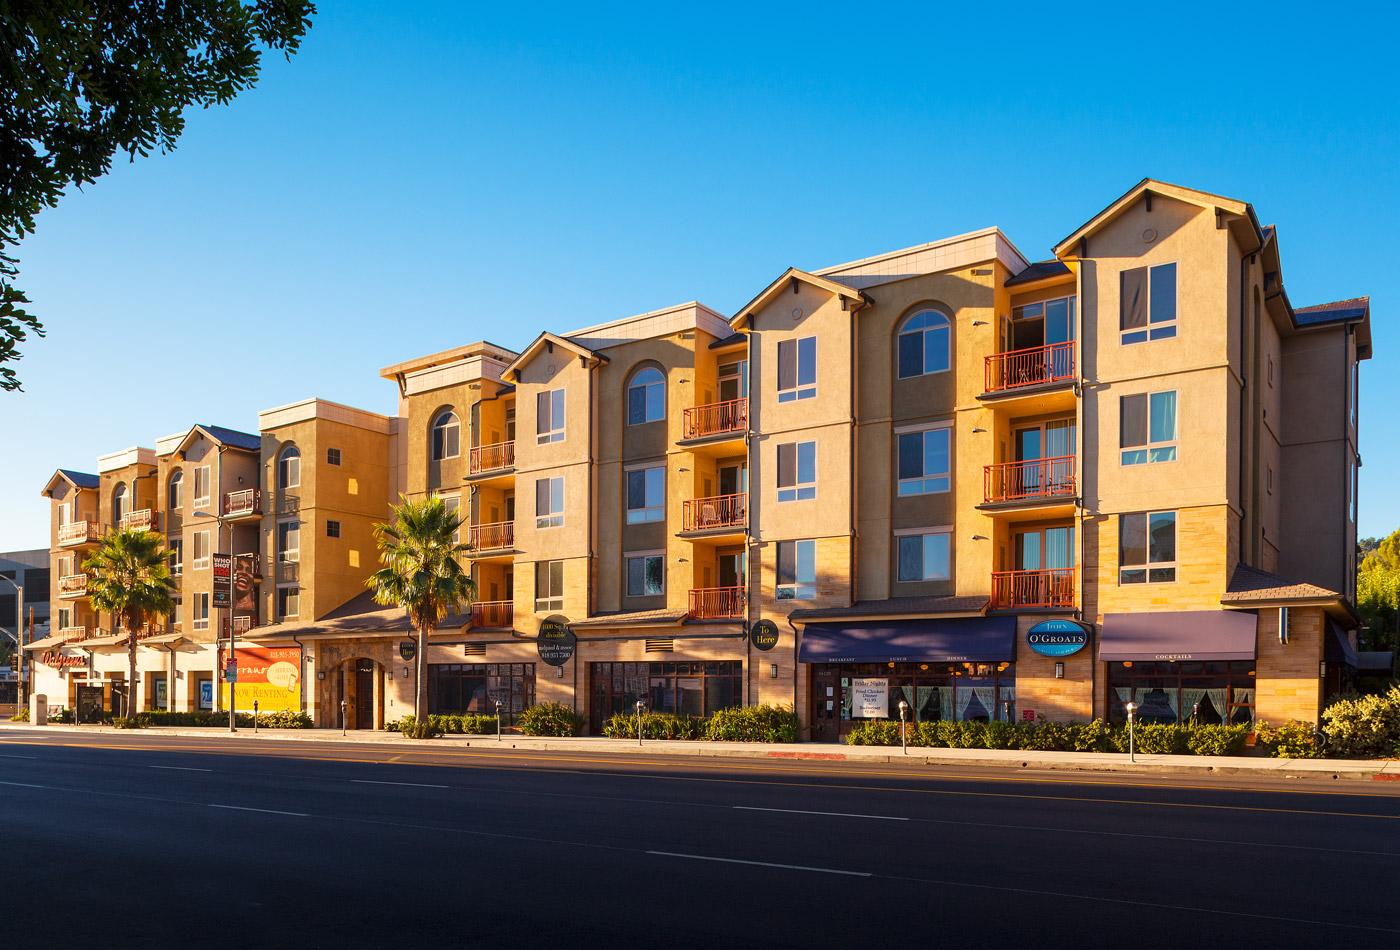 16100 Ventura Boulevard